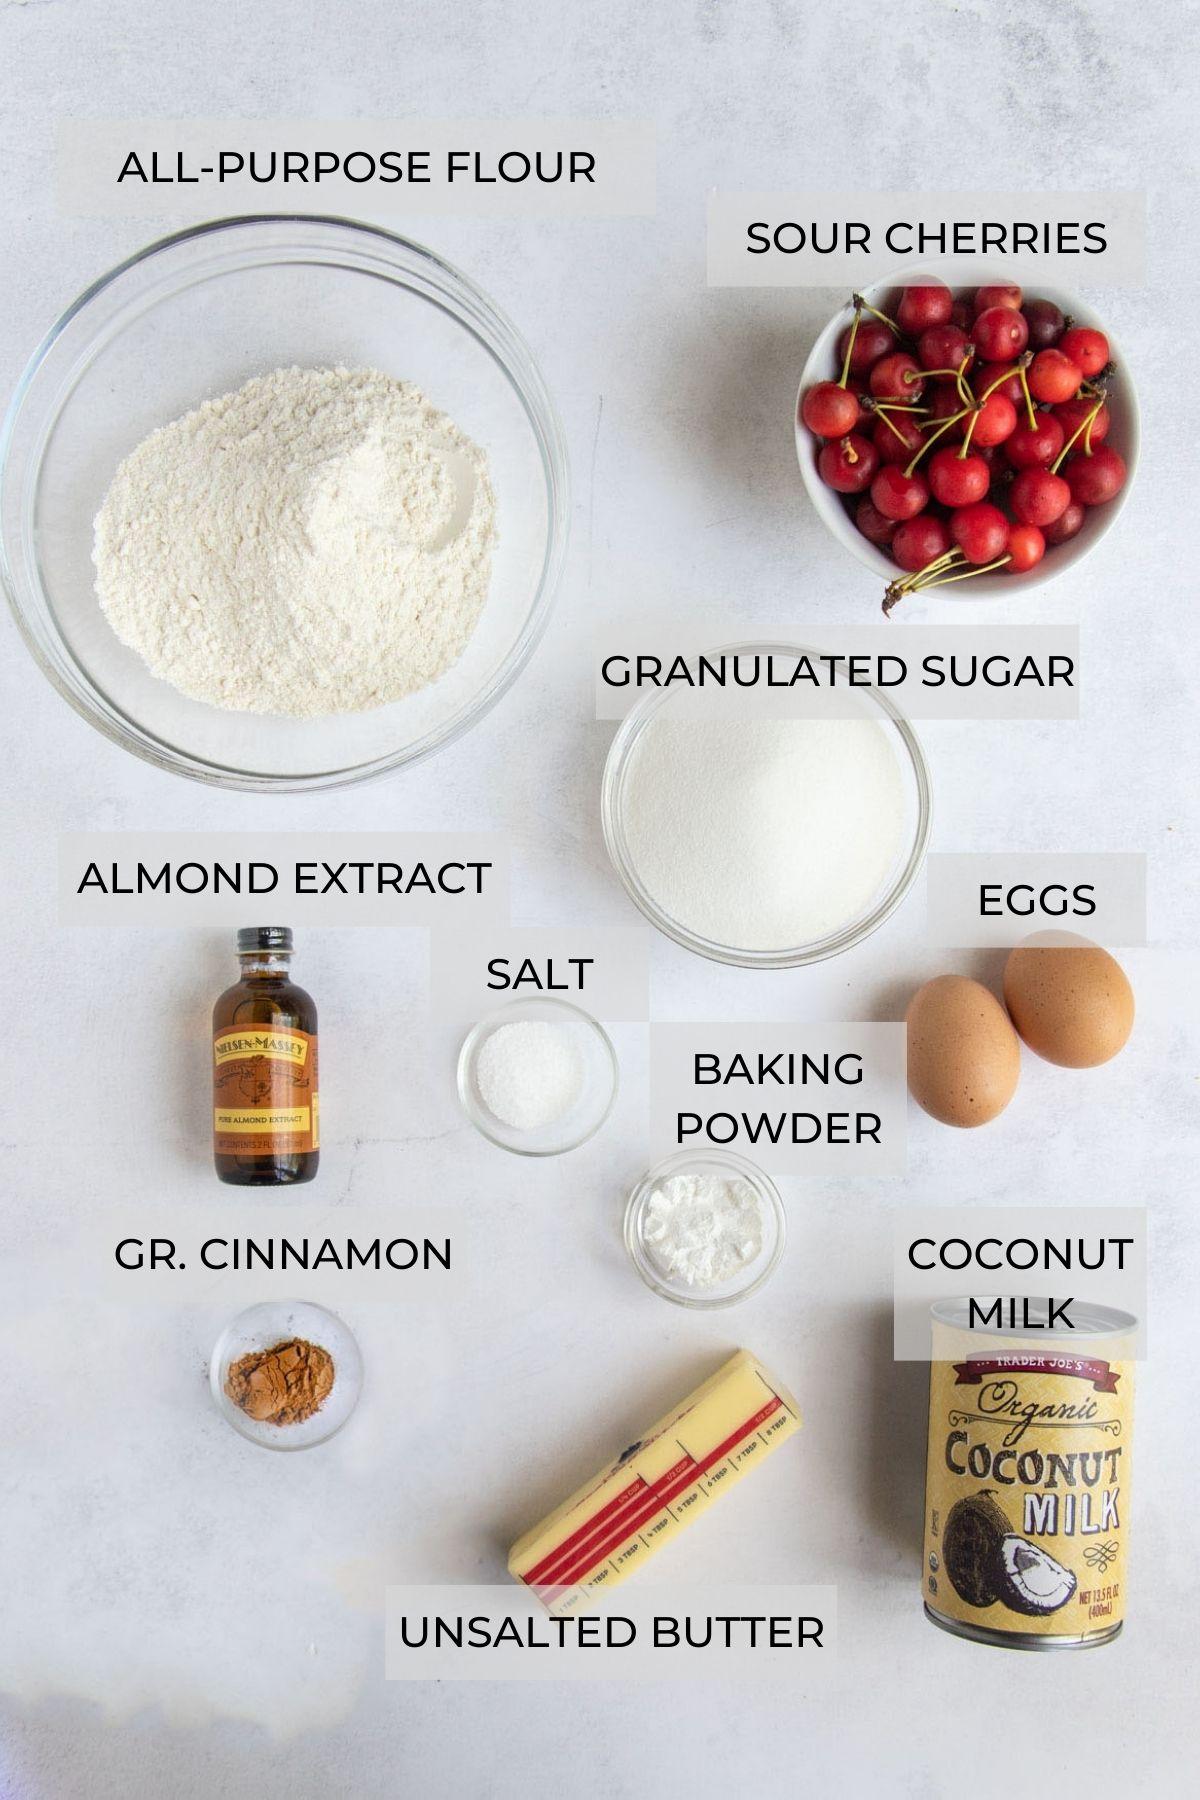 Cherry Coconut upside down cake ingredients - all-purpose flour, sour cherries, sugar, eggs, baking powder, coconut milk, unsalted butter, ground cinnamon, almond extract and kosher salt